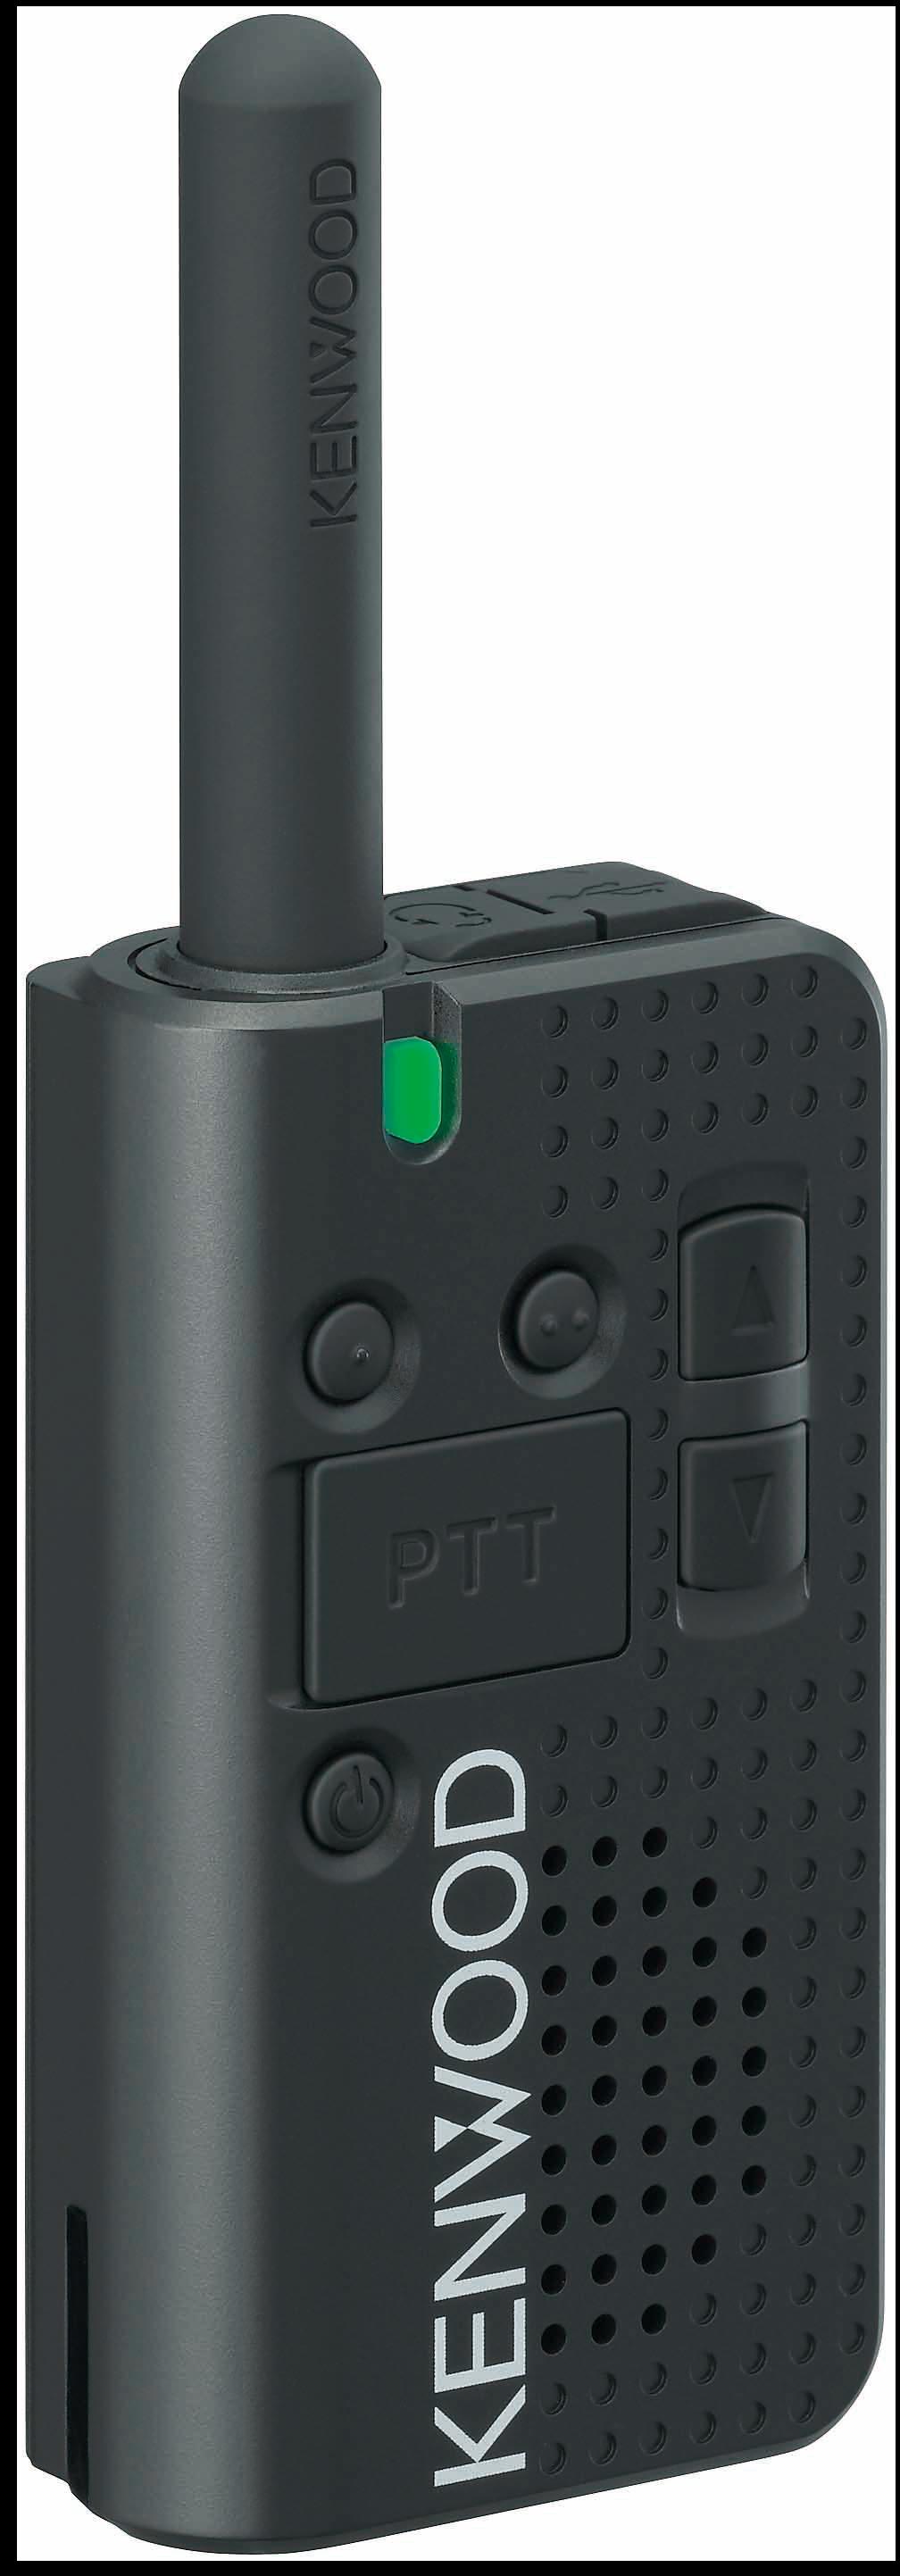 PKT-23, Headset, Filialfunk, ALDI Nord, Retail, Supermarkt, PTT, Walkie Talkie, PMR446